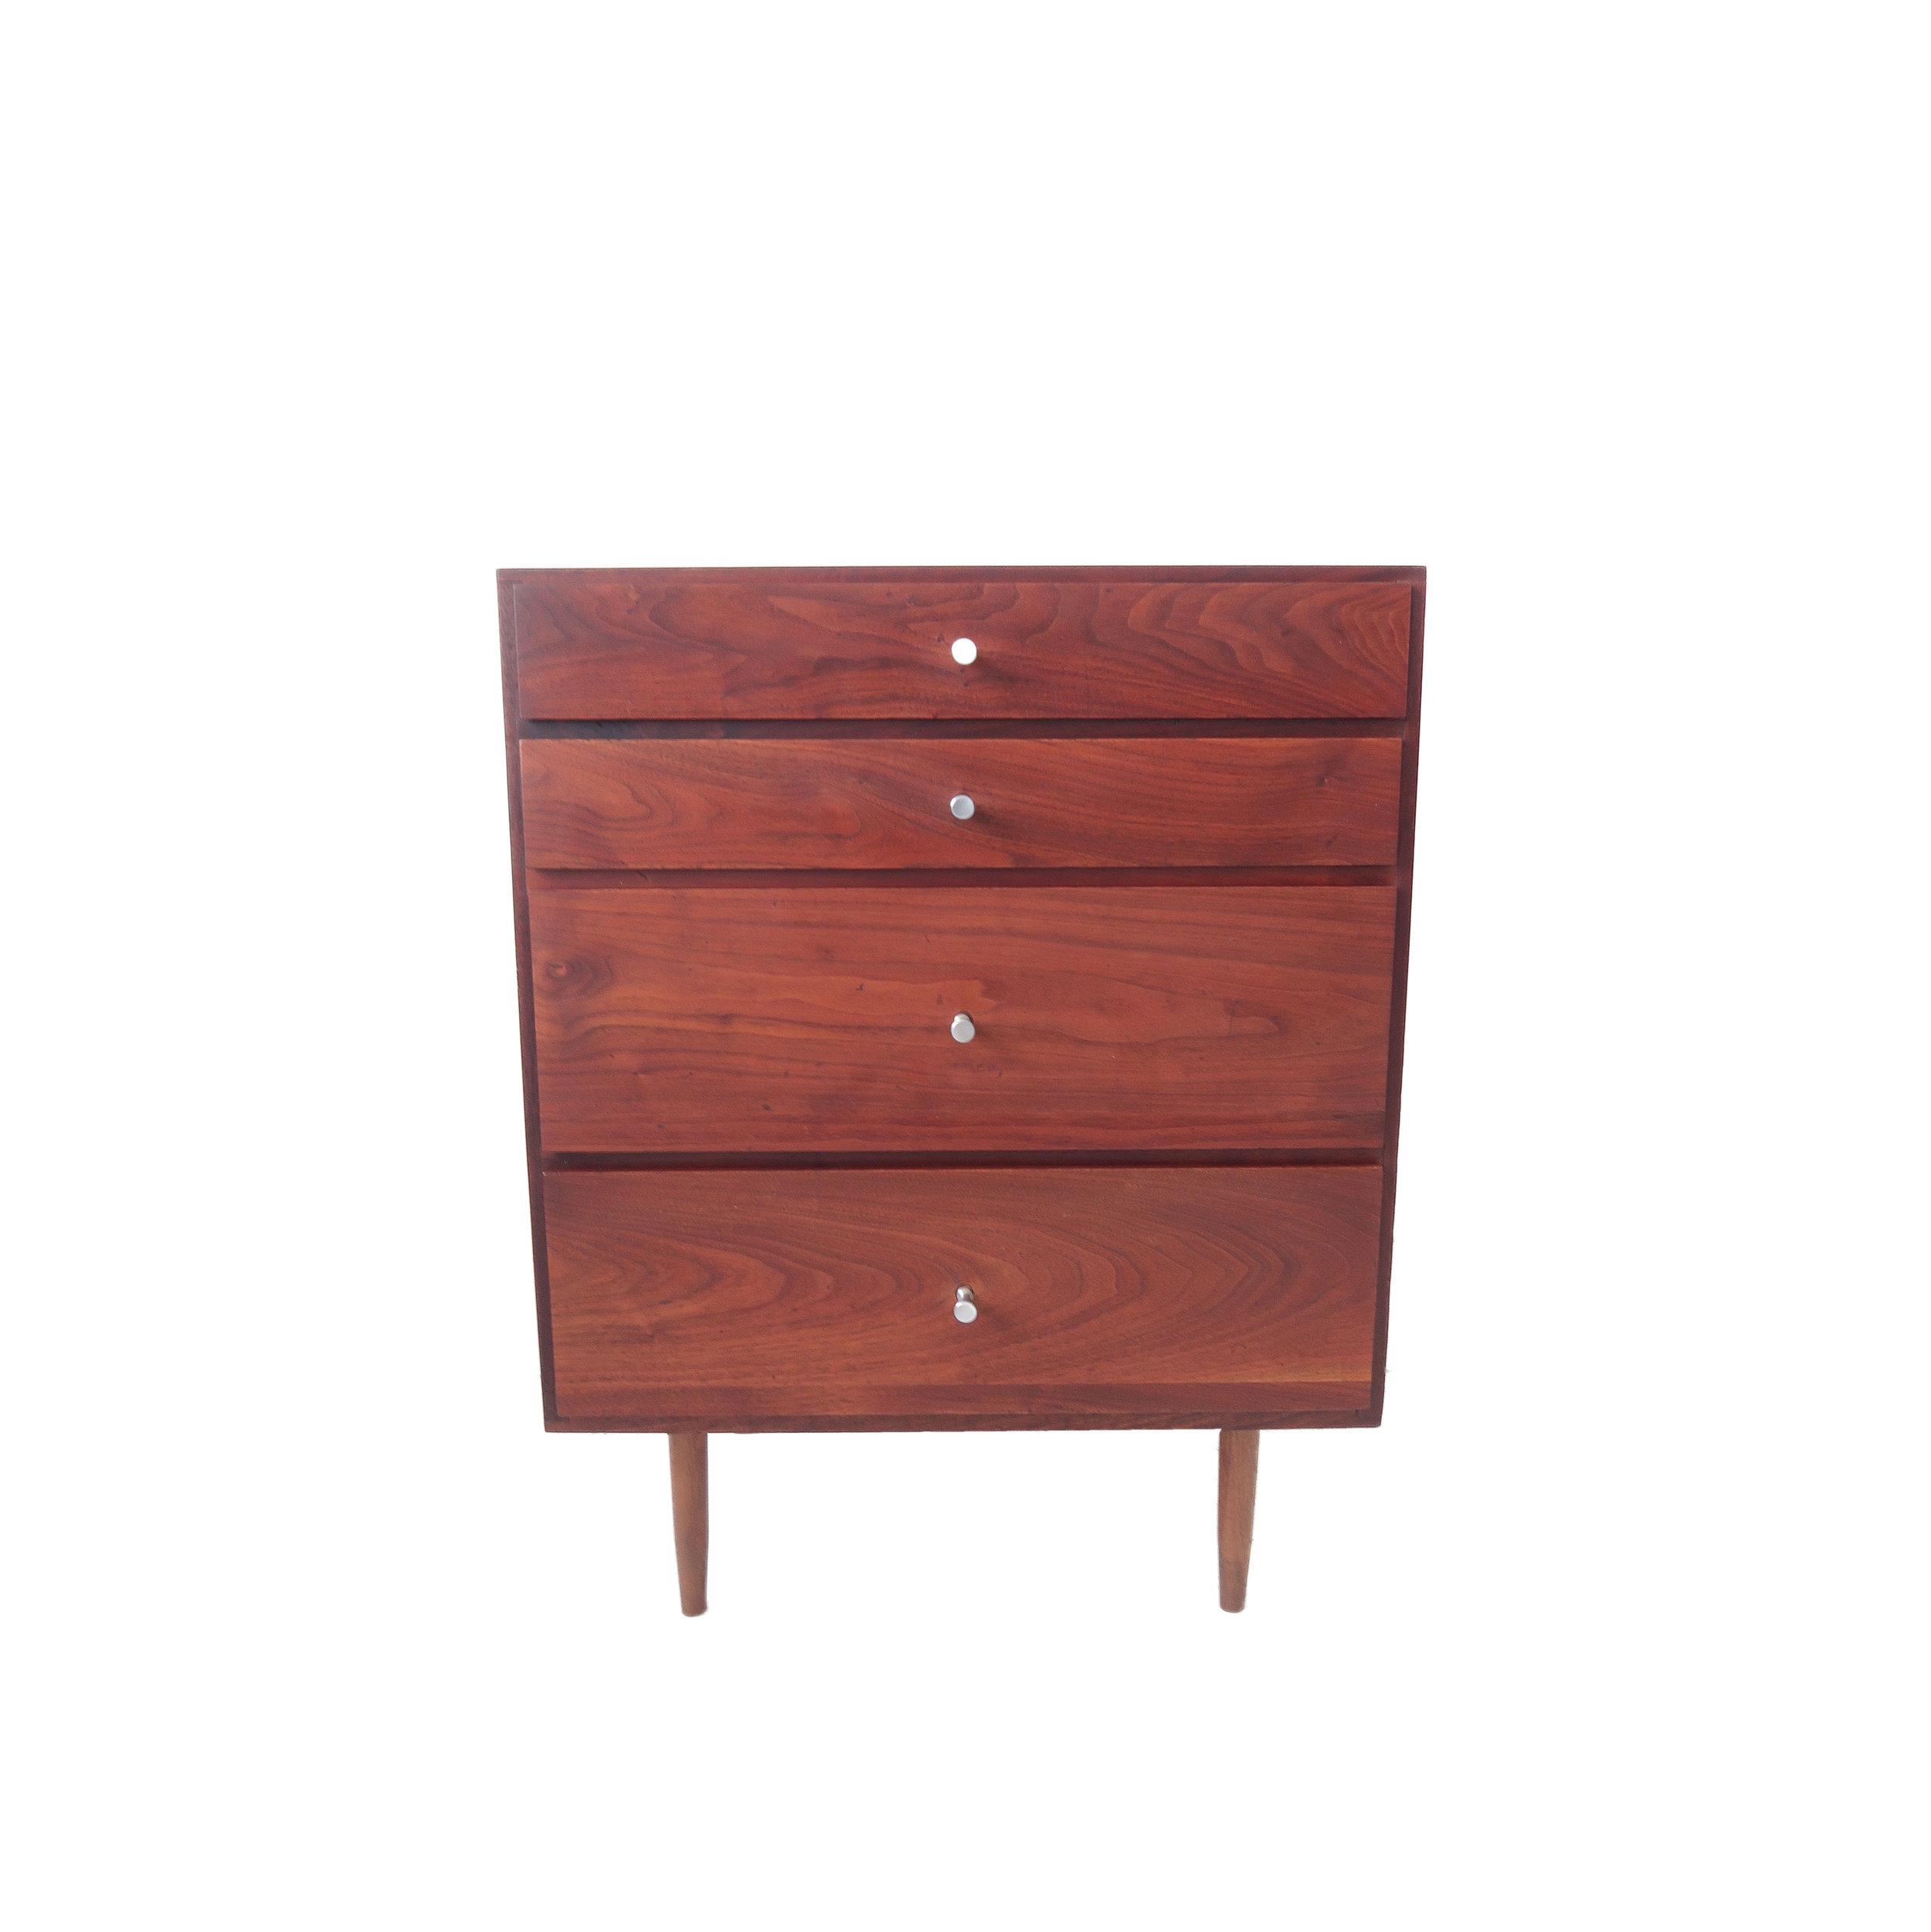 small 4 drawer mid century modern walnut dresser.jpg